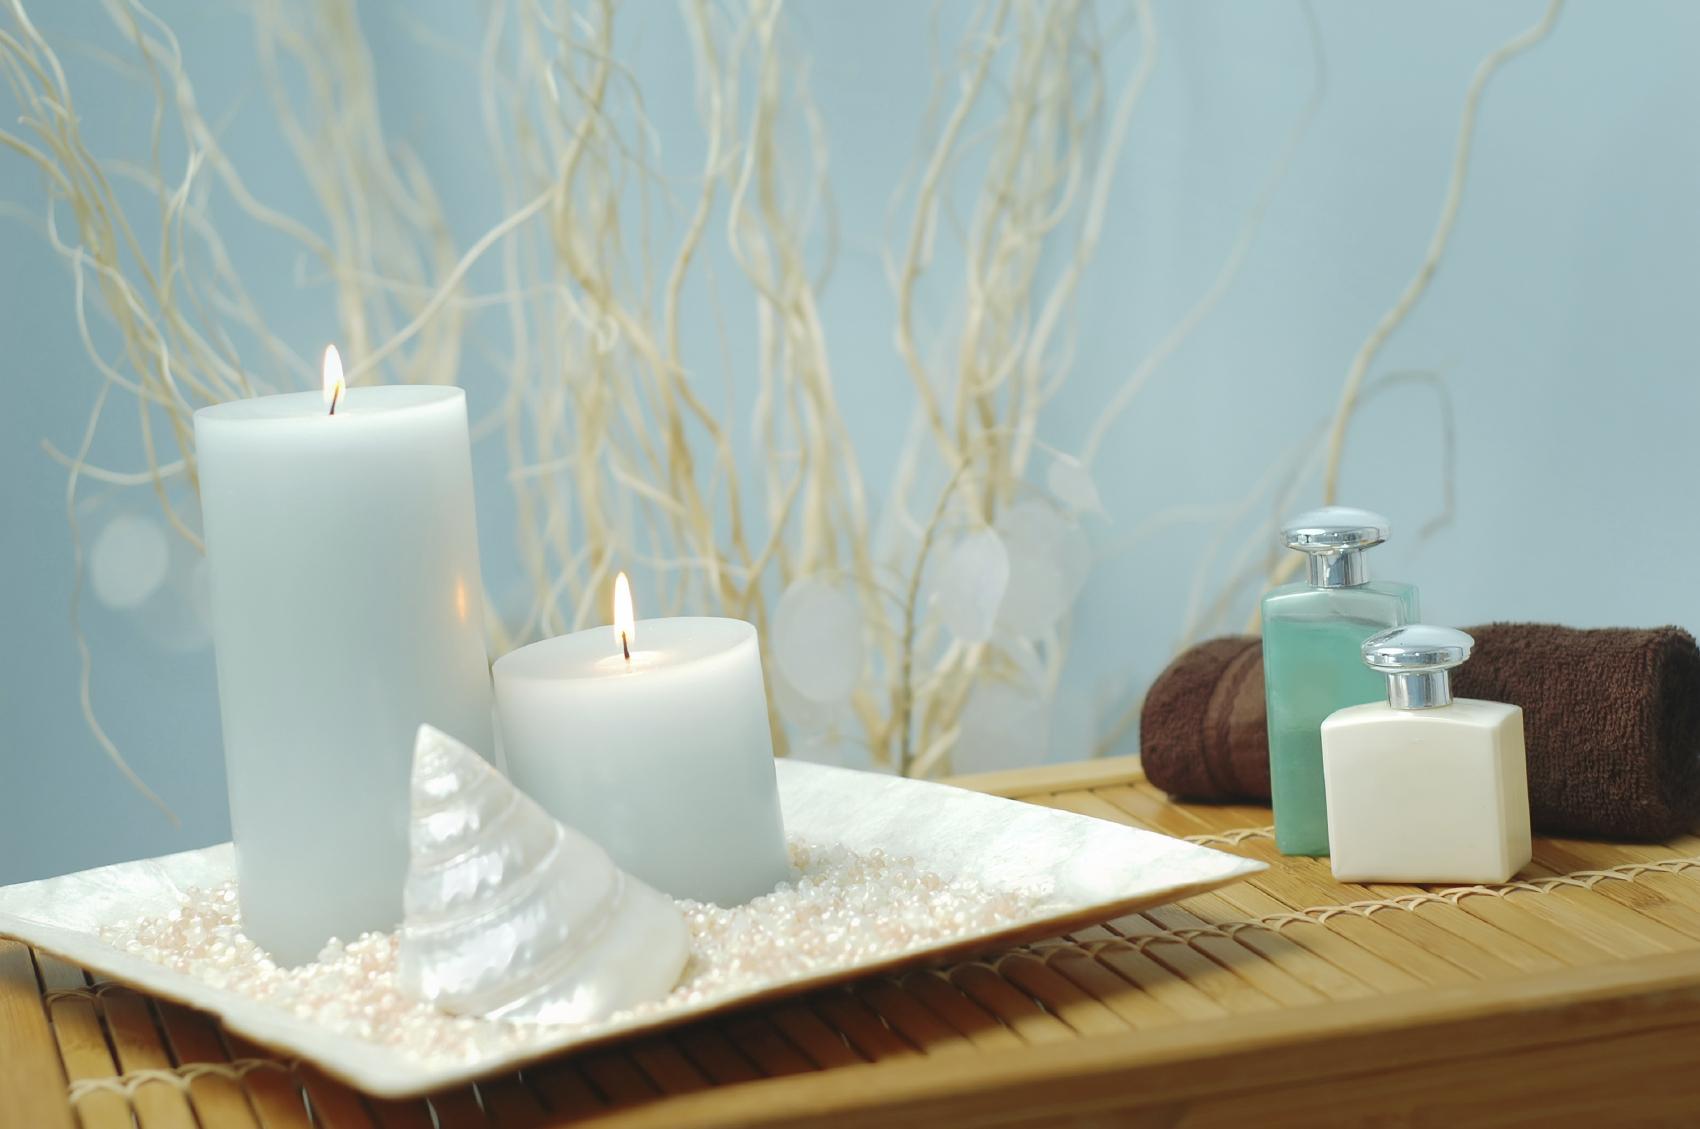 Spa Treatment Tray | Serenity Massage + Wellness Spa